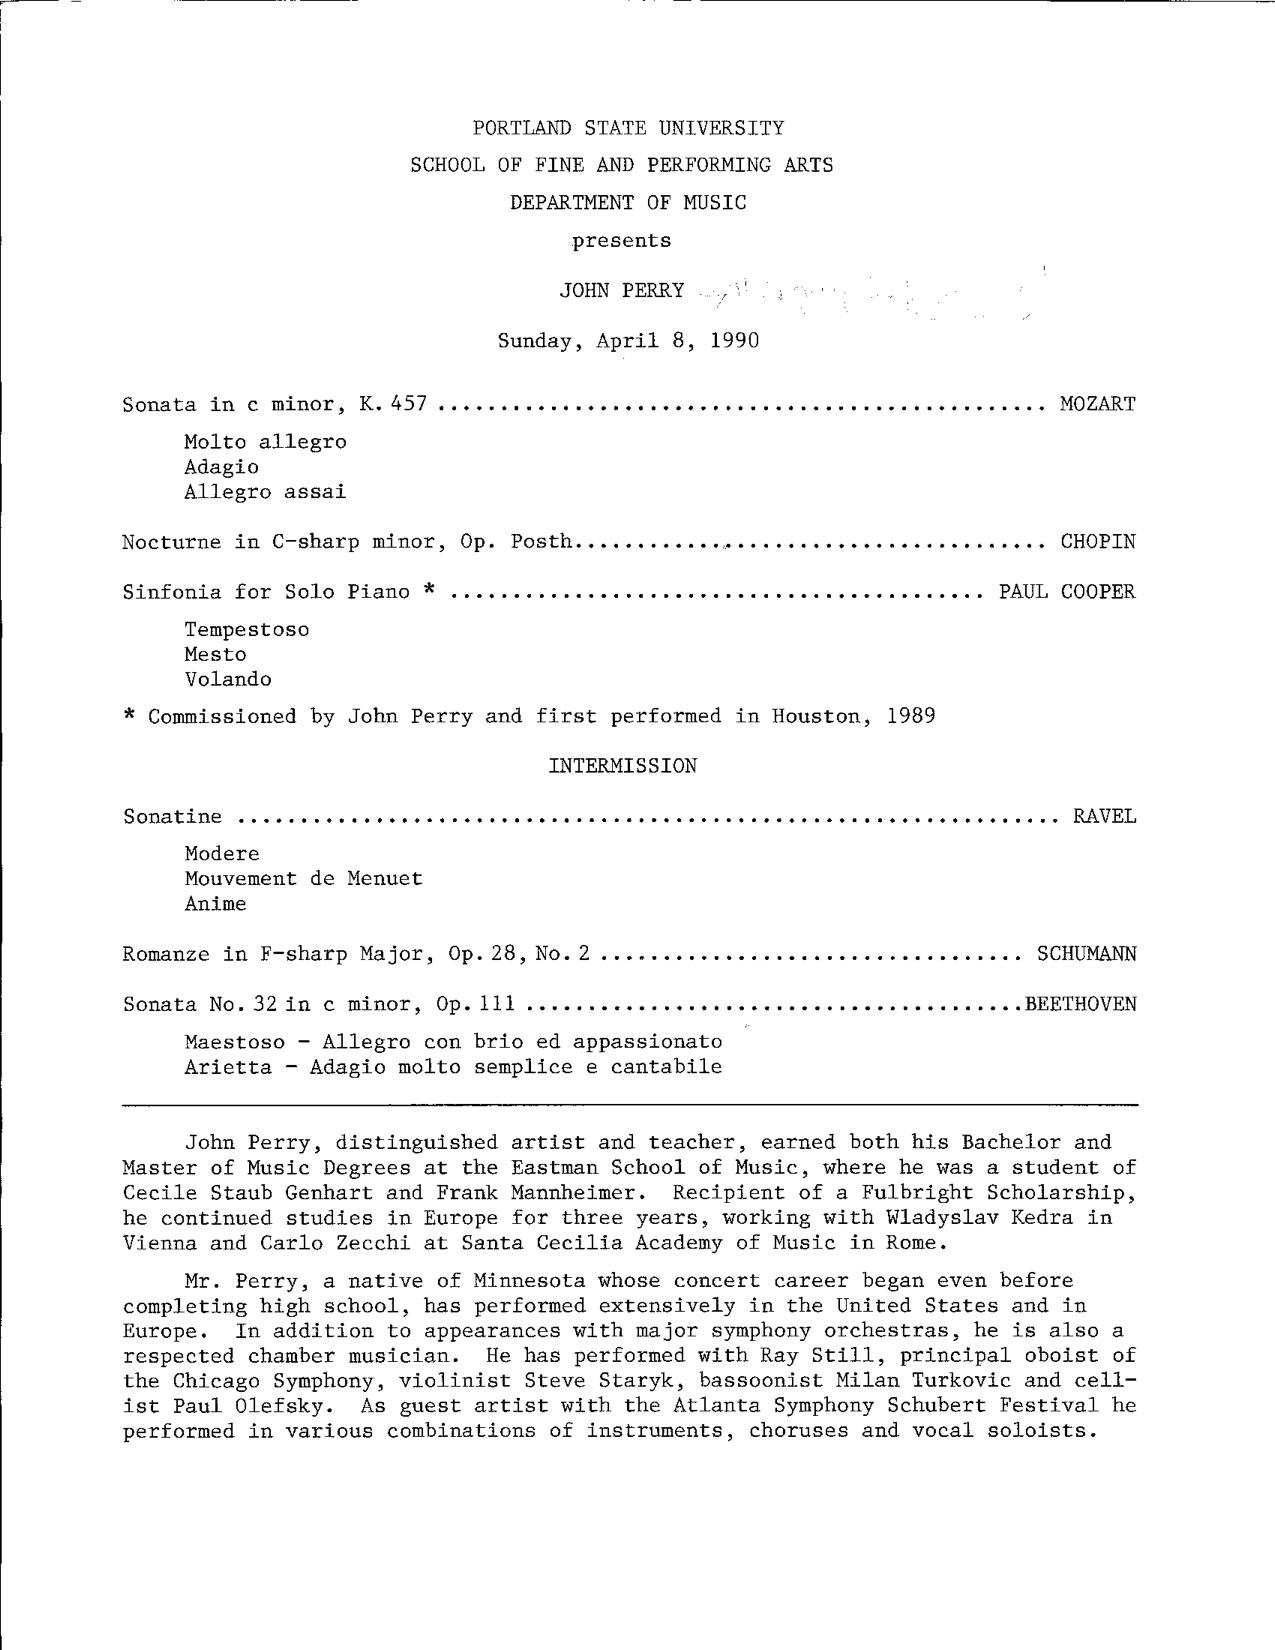 Perry89-90_Program2.jpg